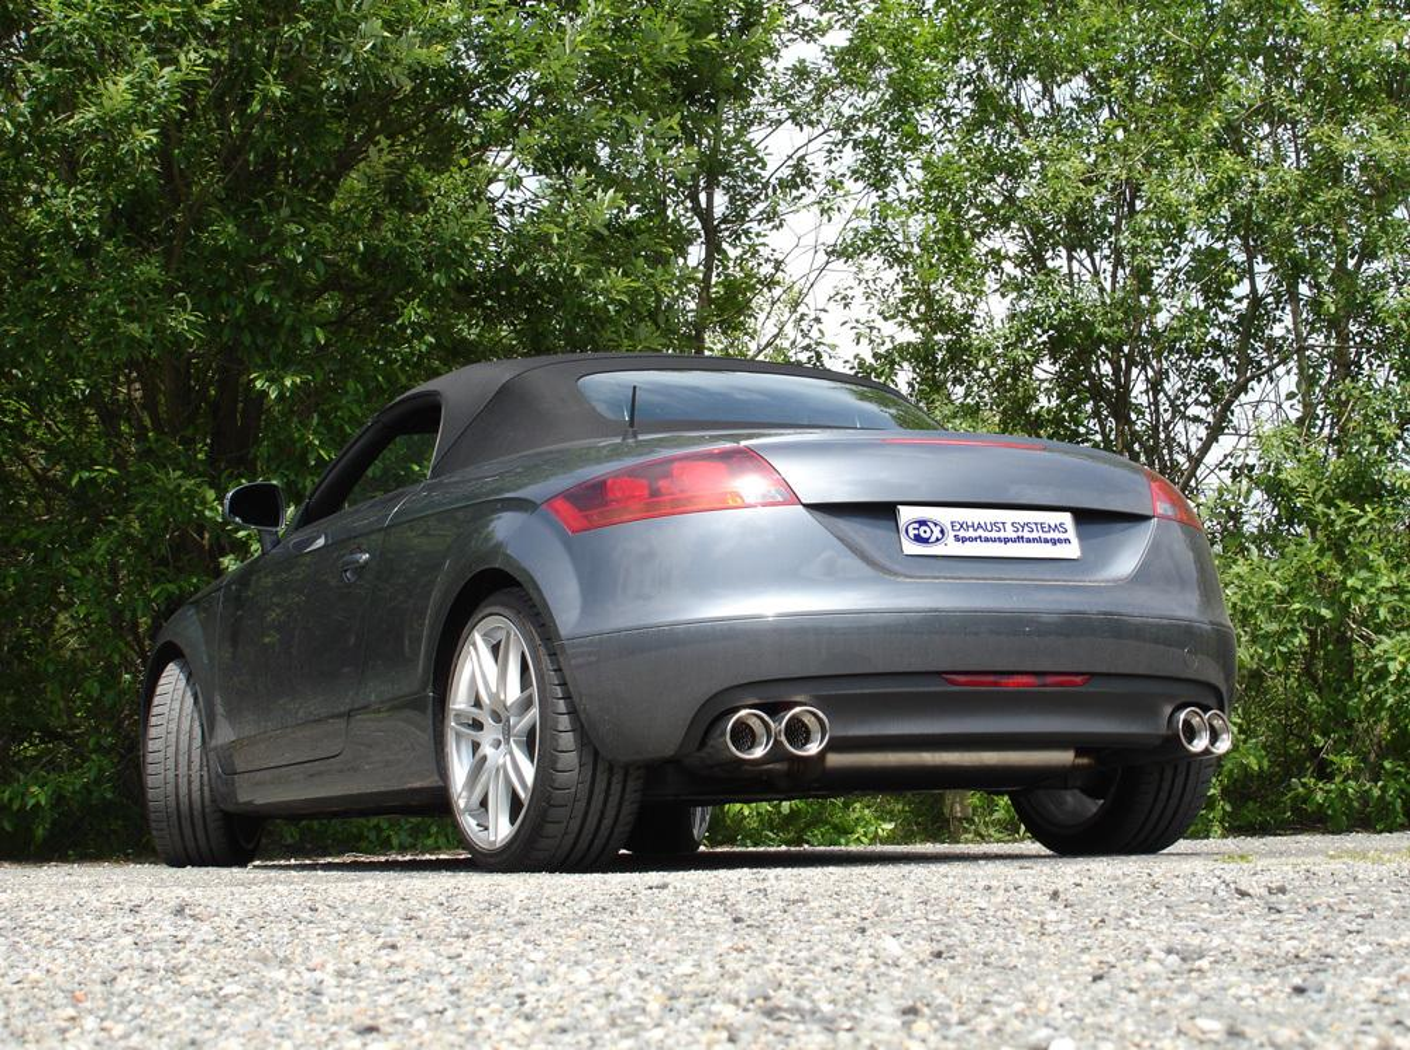 Roadster 2x100mm rund Fox Duplex Sportauspuff Audi TT 8J quattro Coupe u